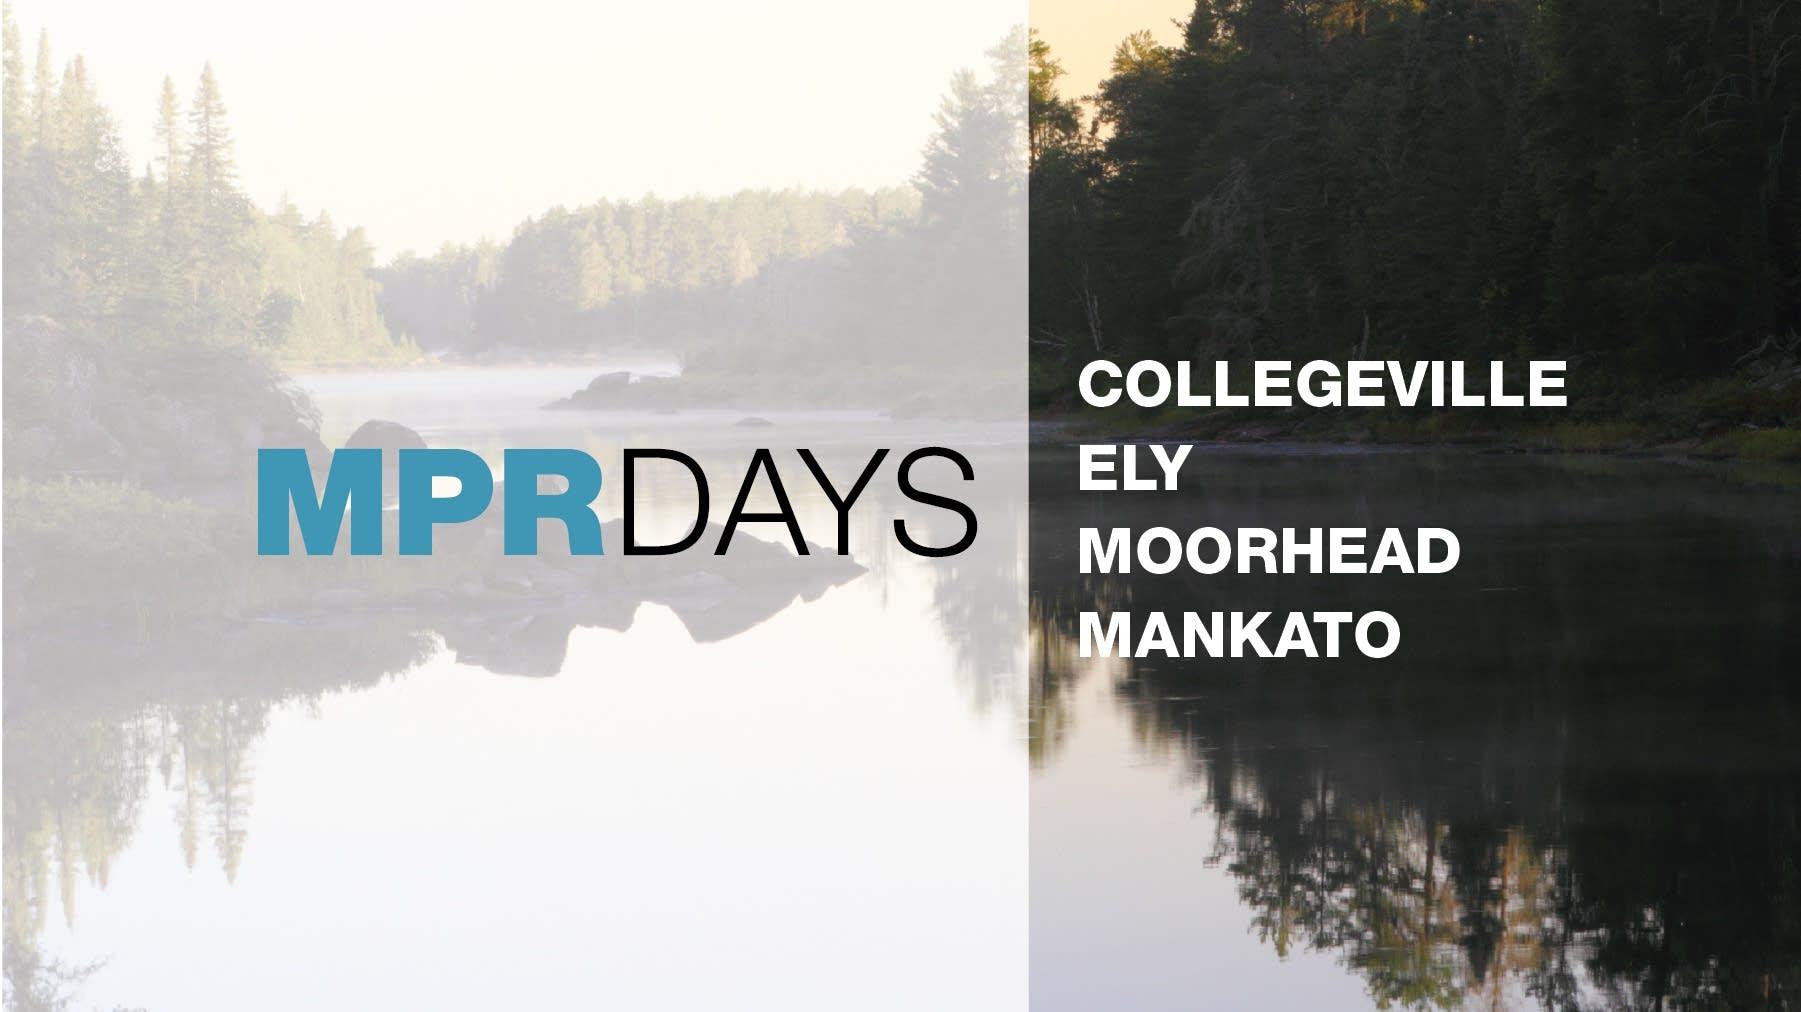 MPR Days around Minnesota for MPR50